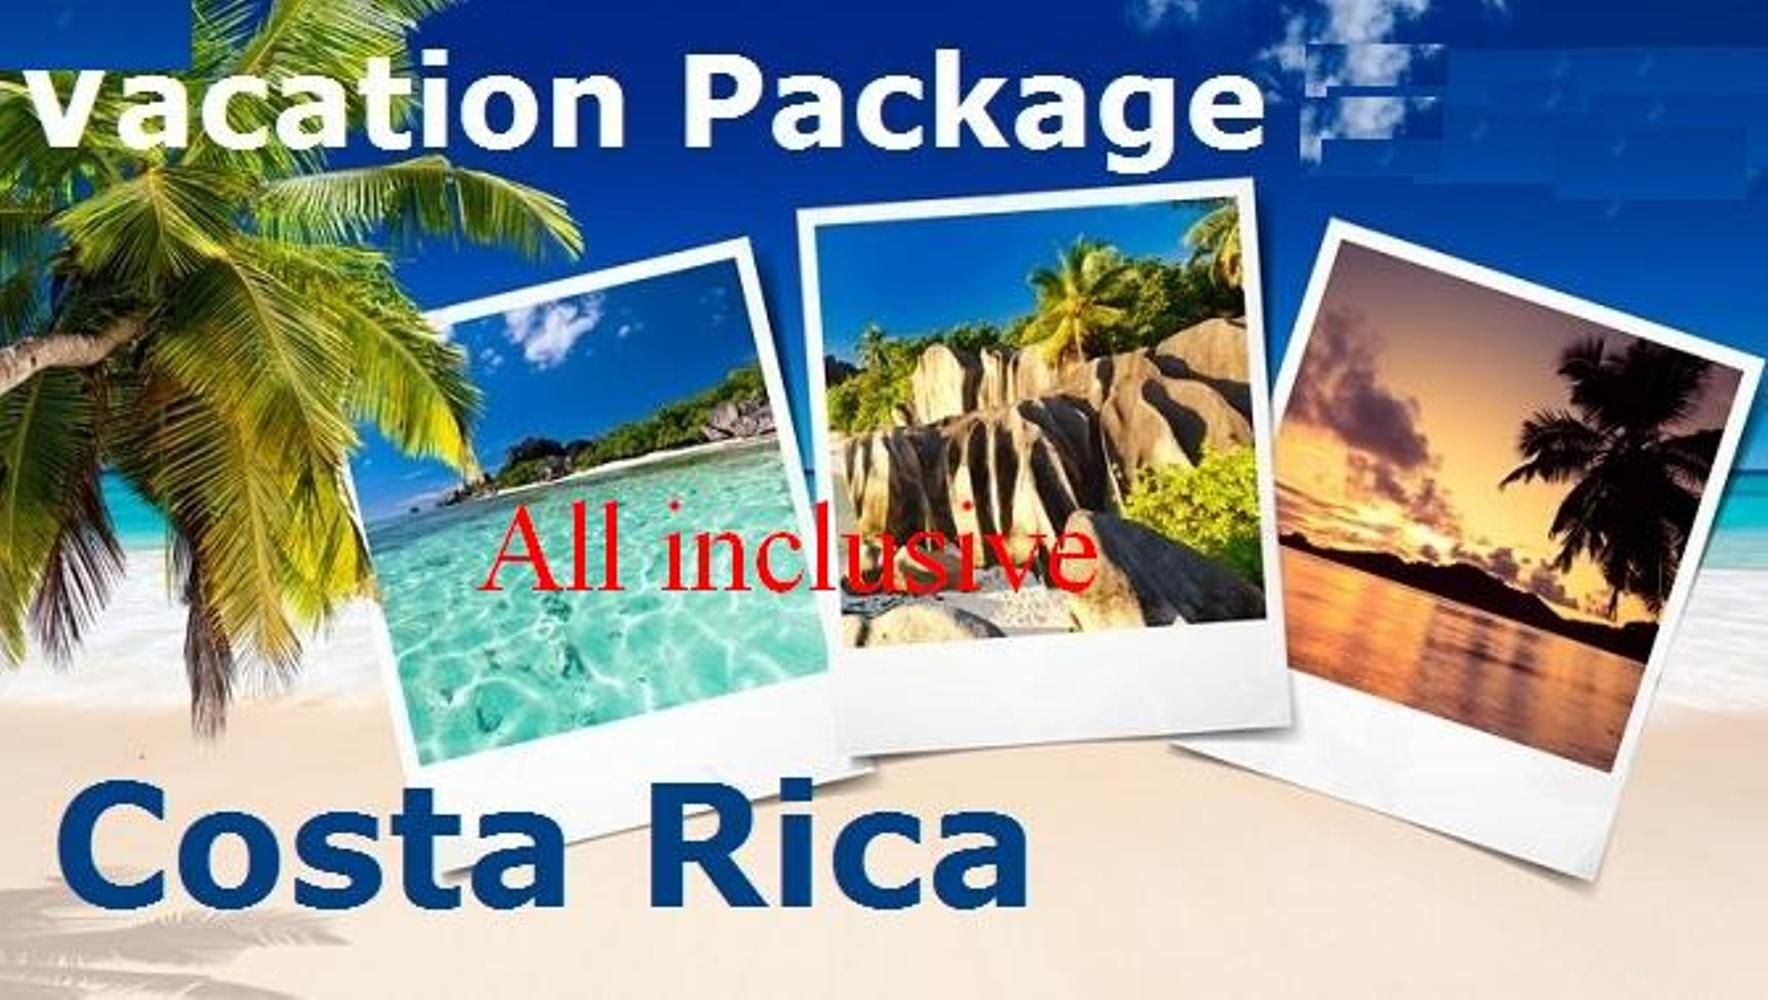 Visit Popular Tourist Hotspot, Costa Rica With All